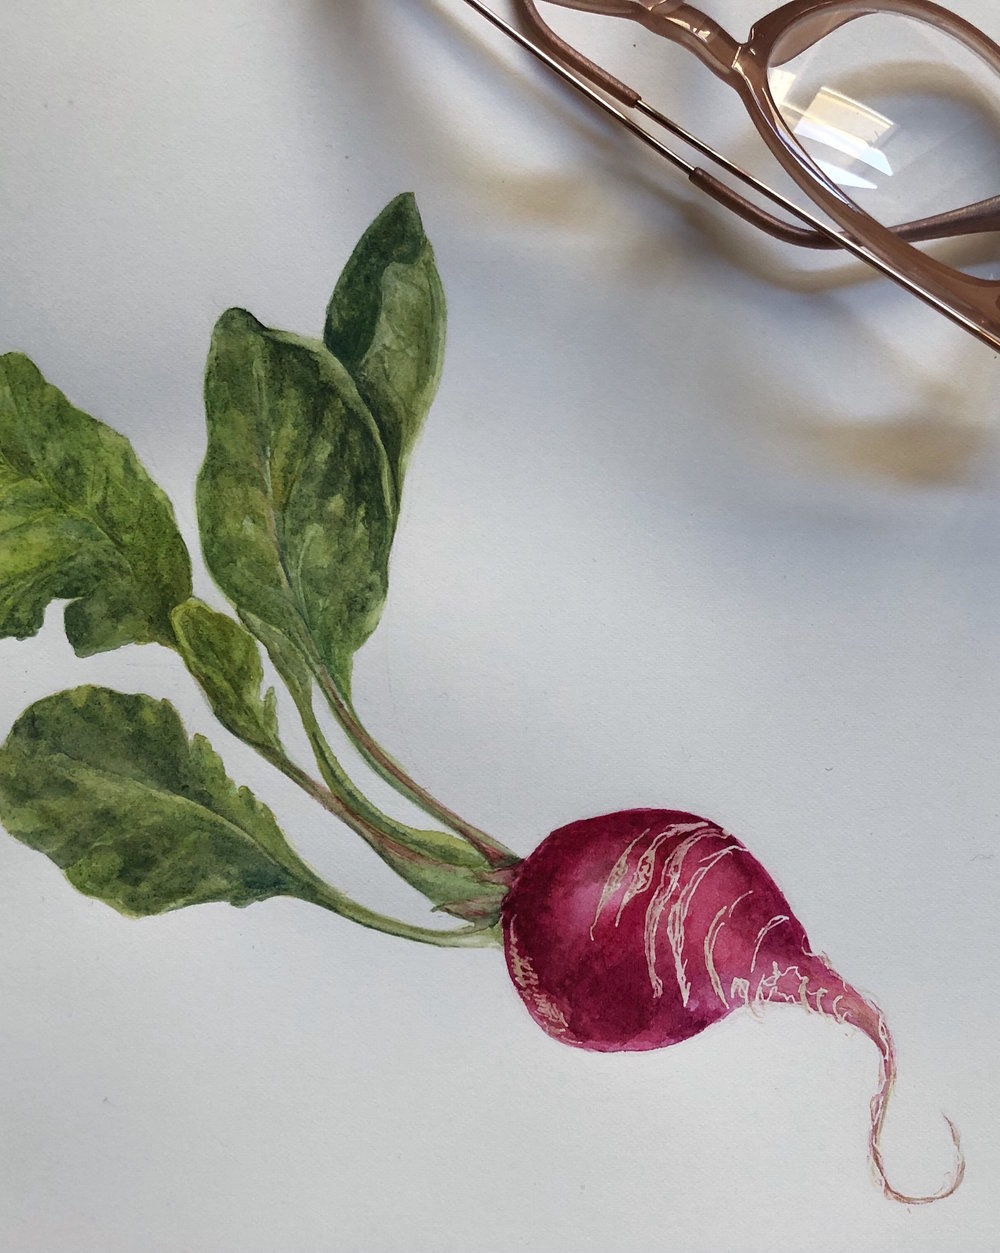 harvest-radish.JPG